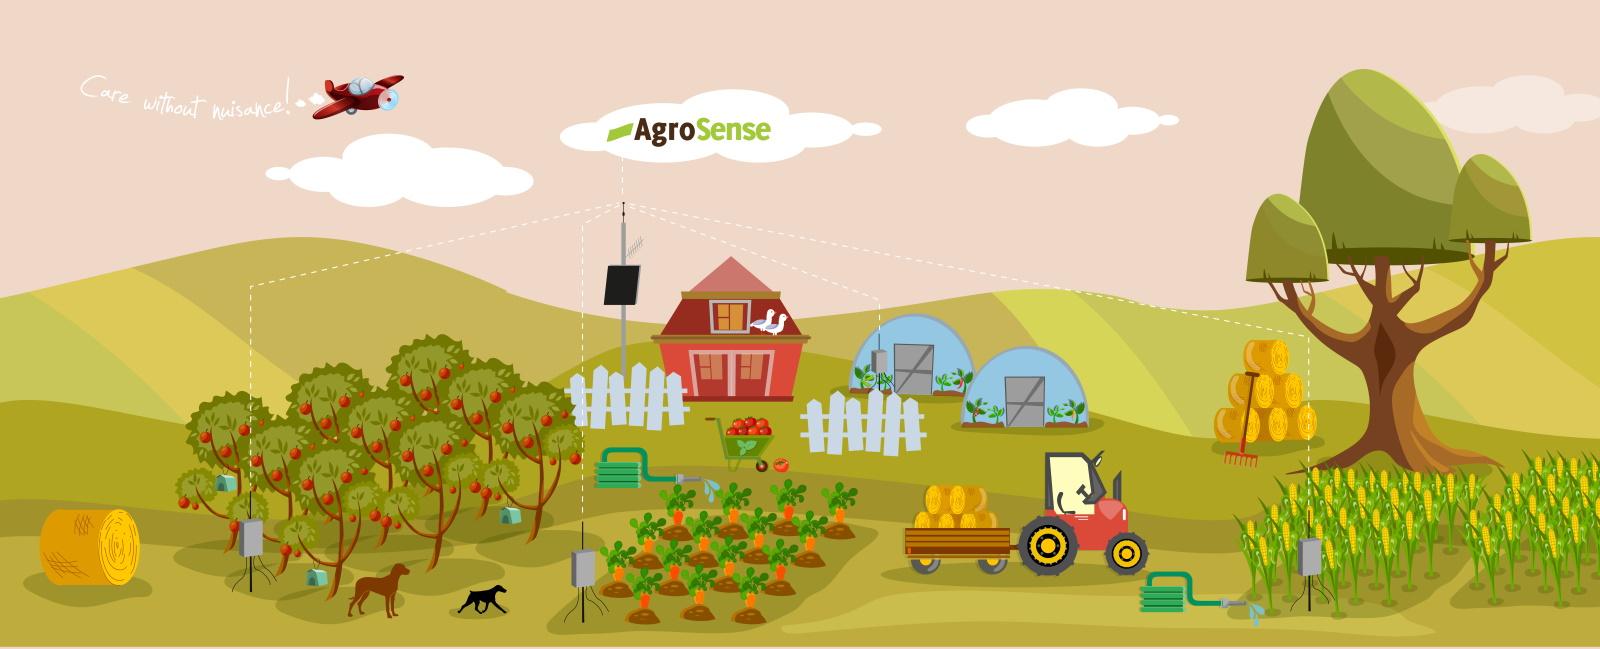 AgroSense Farm EN